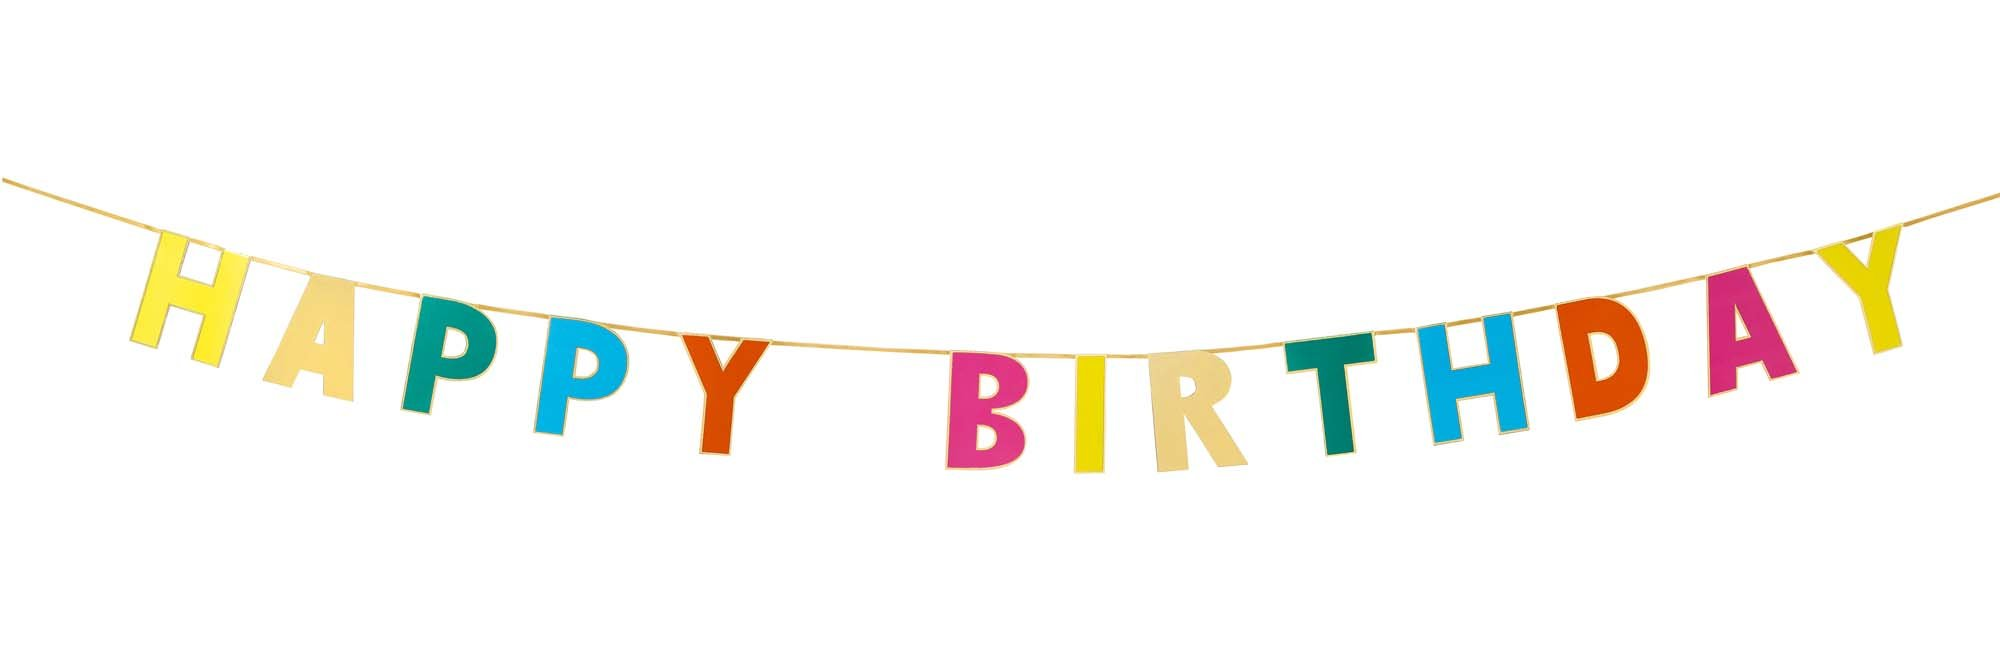 guirlande-joyeux-anniversaire-multicolore-arc-en-ciel-talking-tables